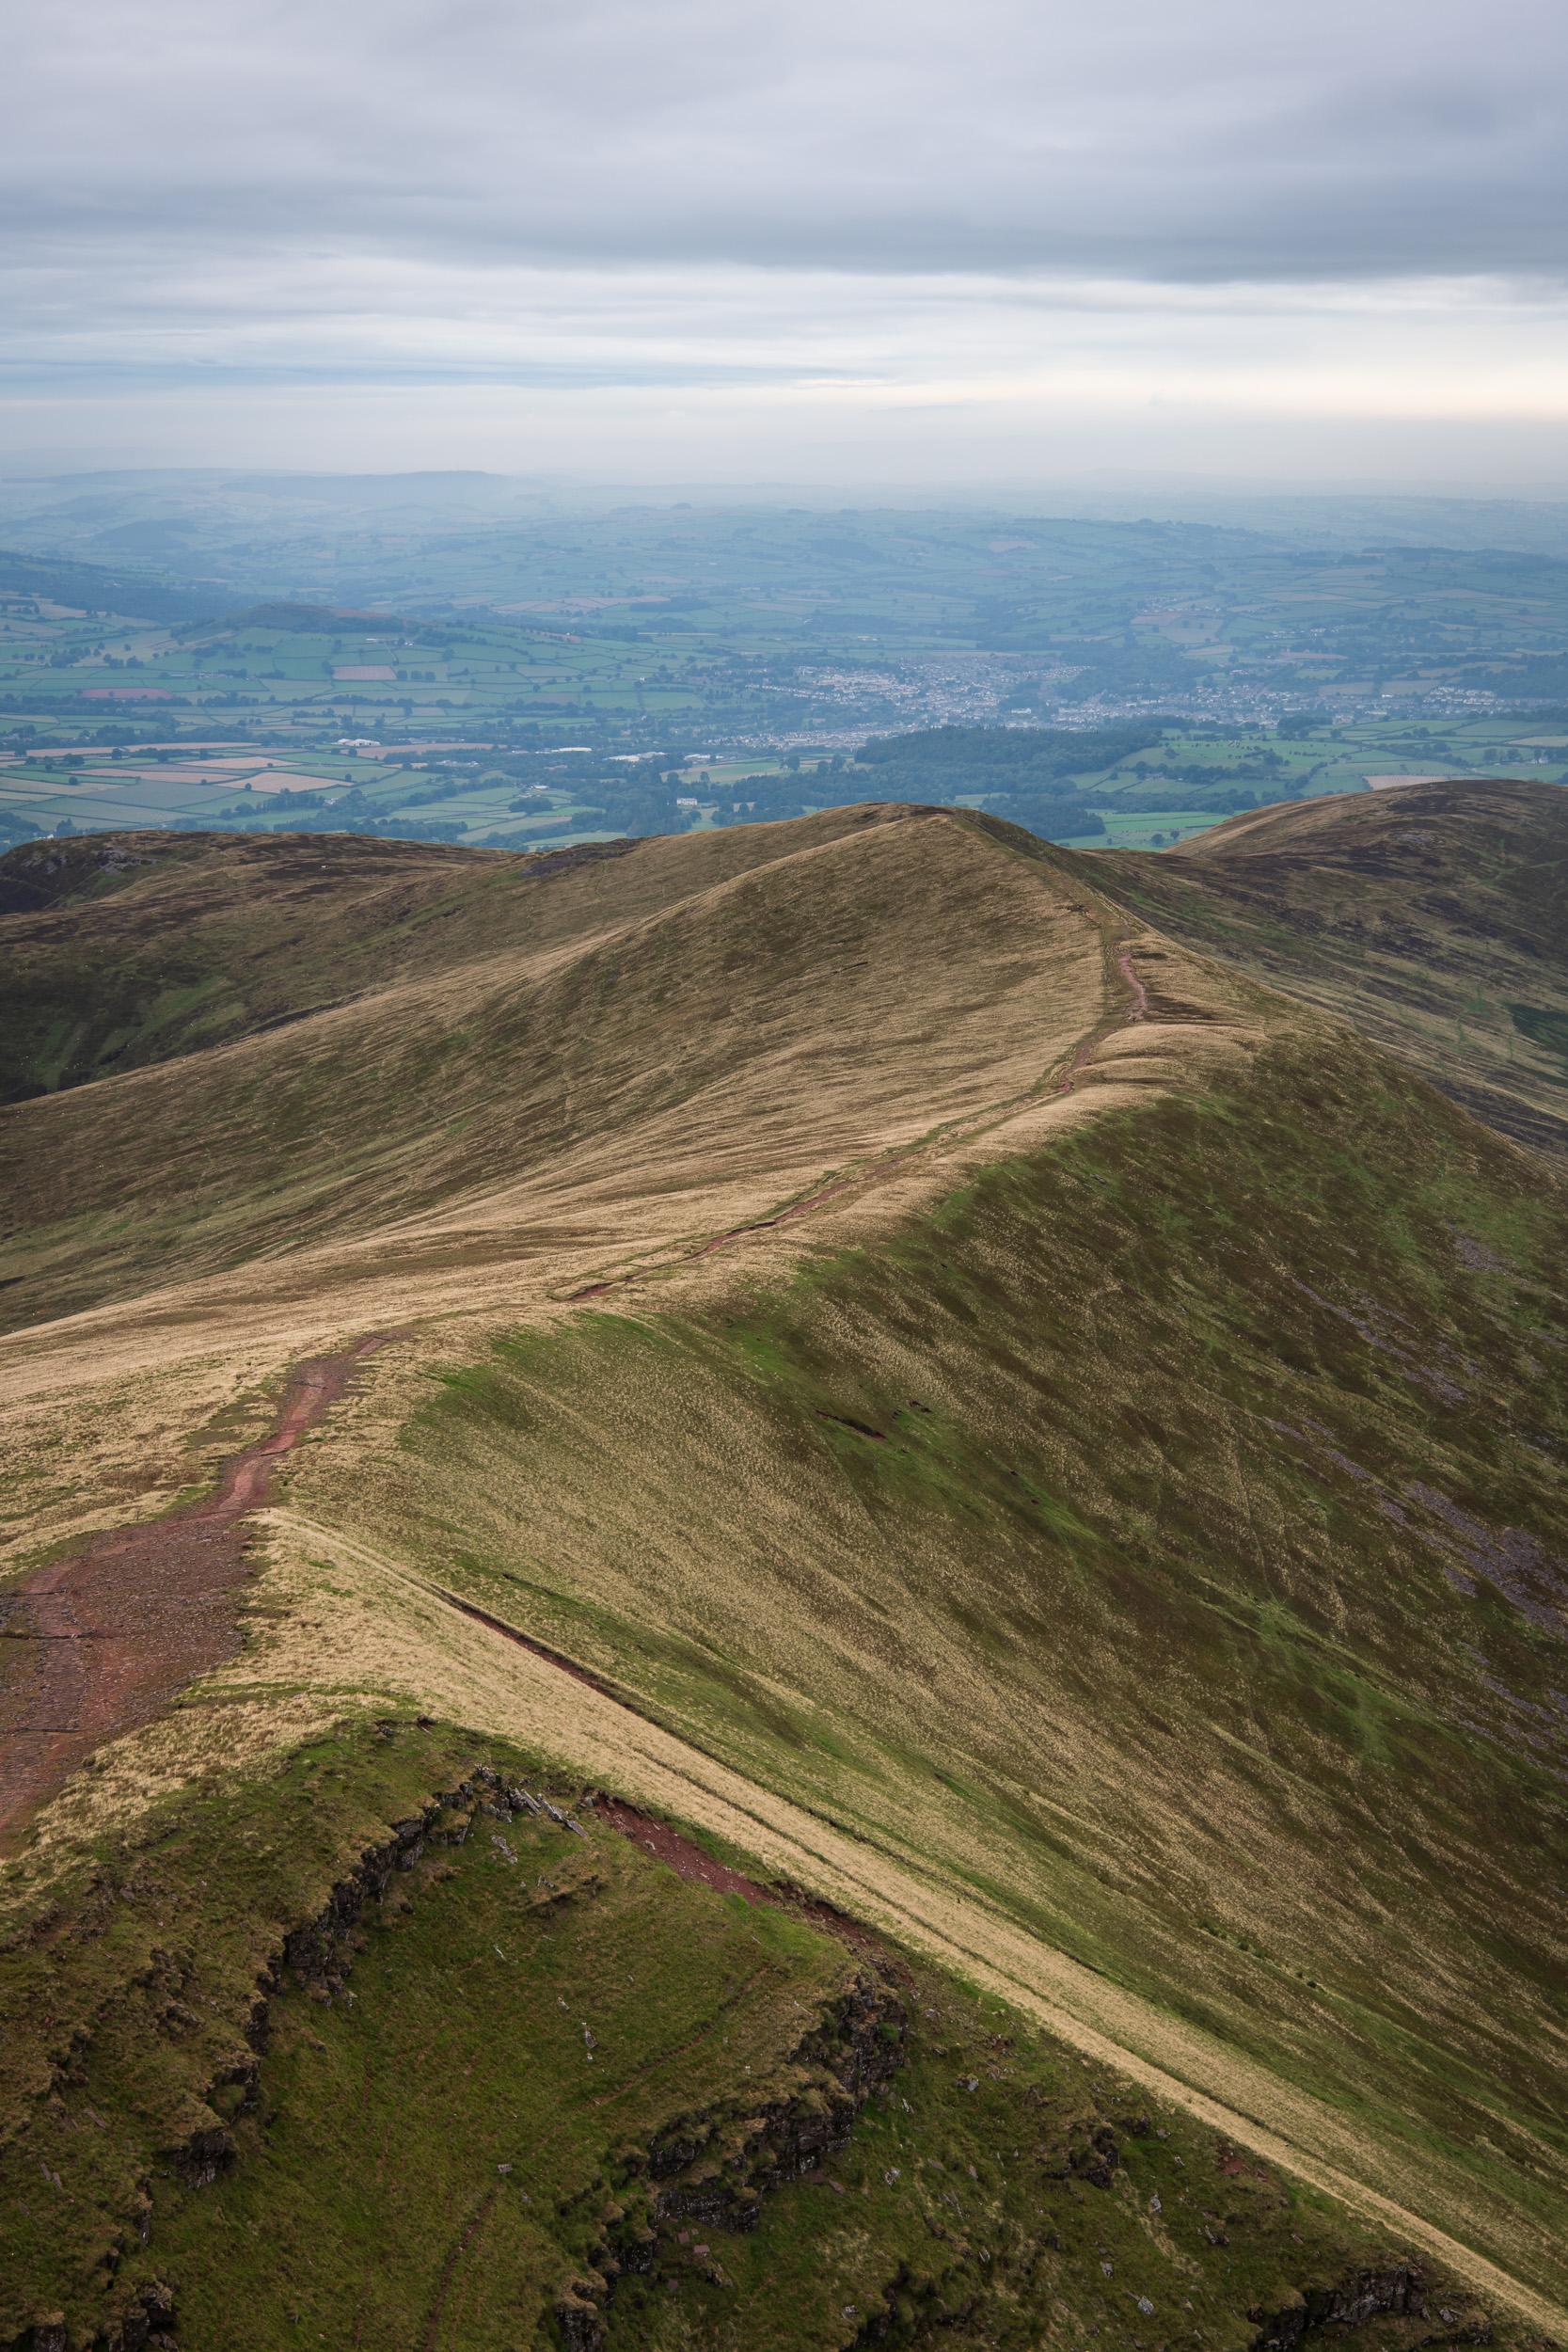 Cefn Cwm Llwch Mountain Path -  Pen y Fan, Brecon Beacons, Wales: Nikon D850, Nikkor 24-70 mm f/2.8 VR at 34 mm, 1/80th sec at ISO 64, f/8.